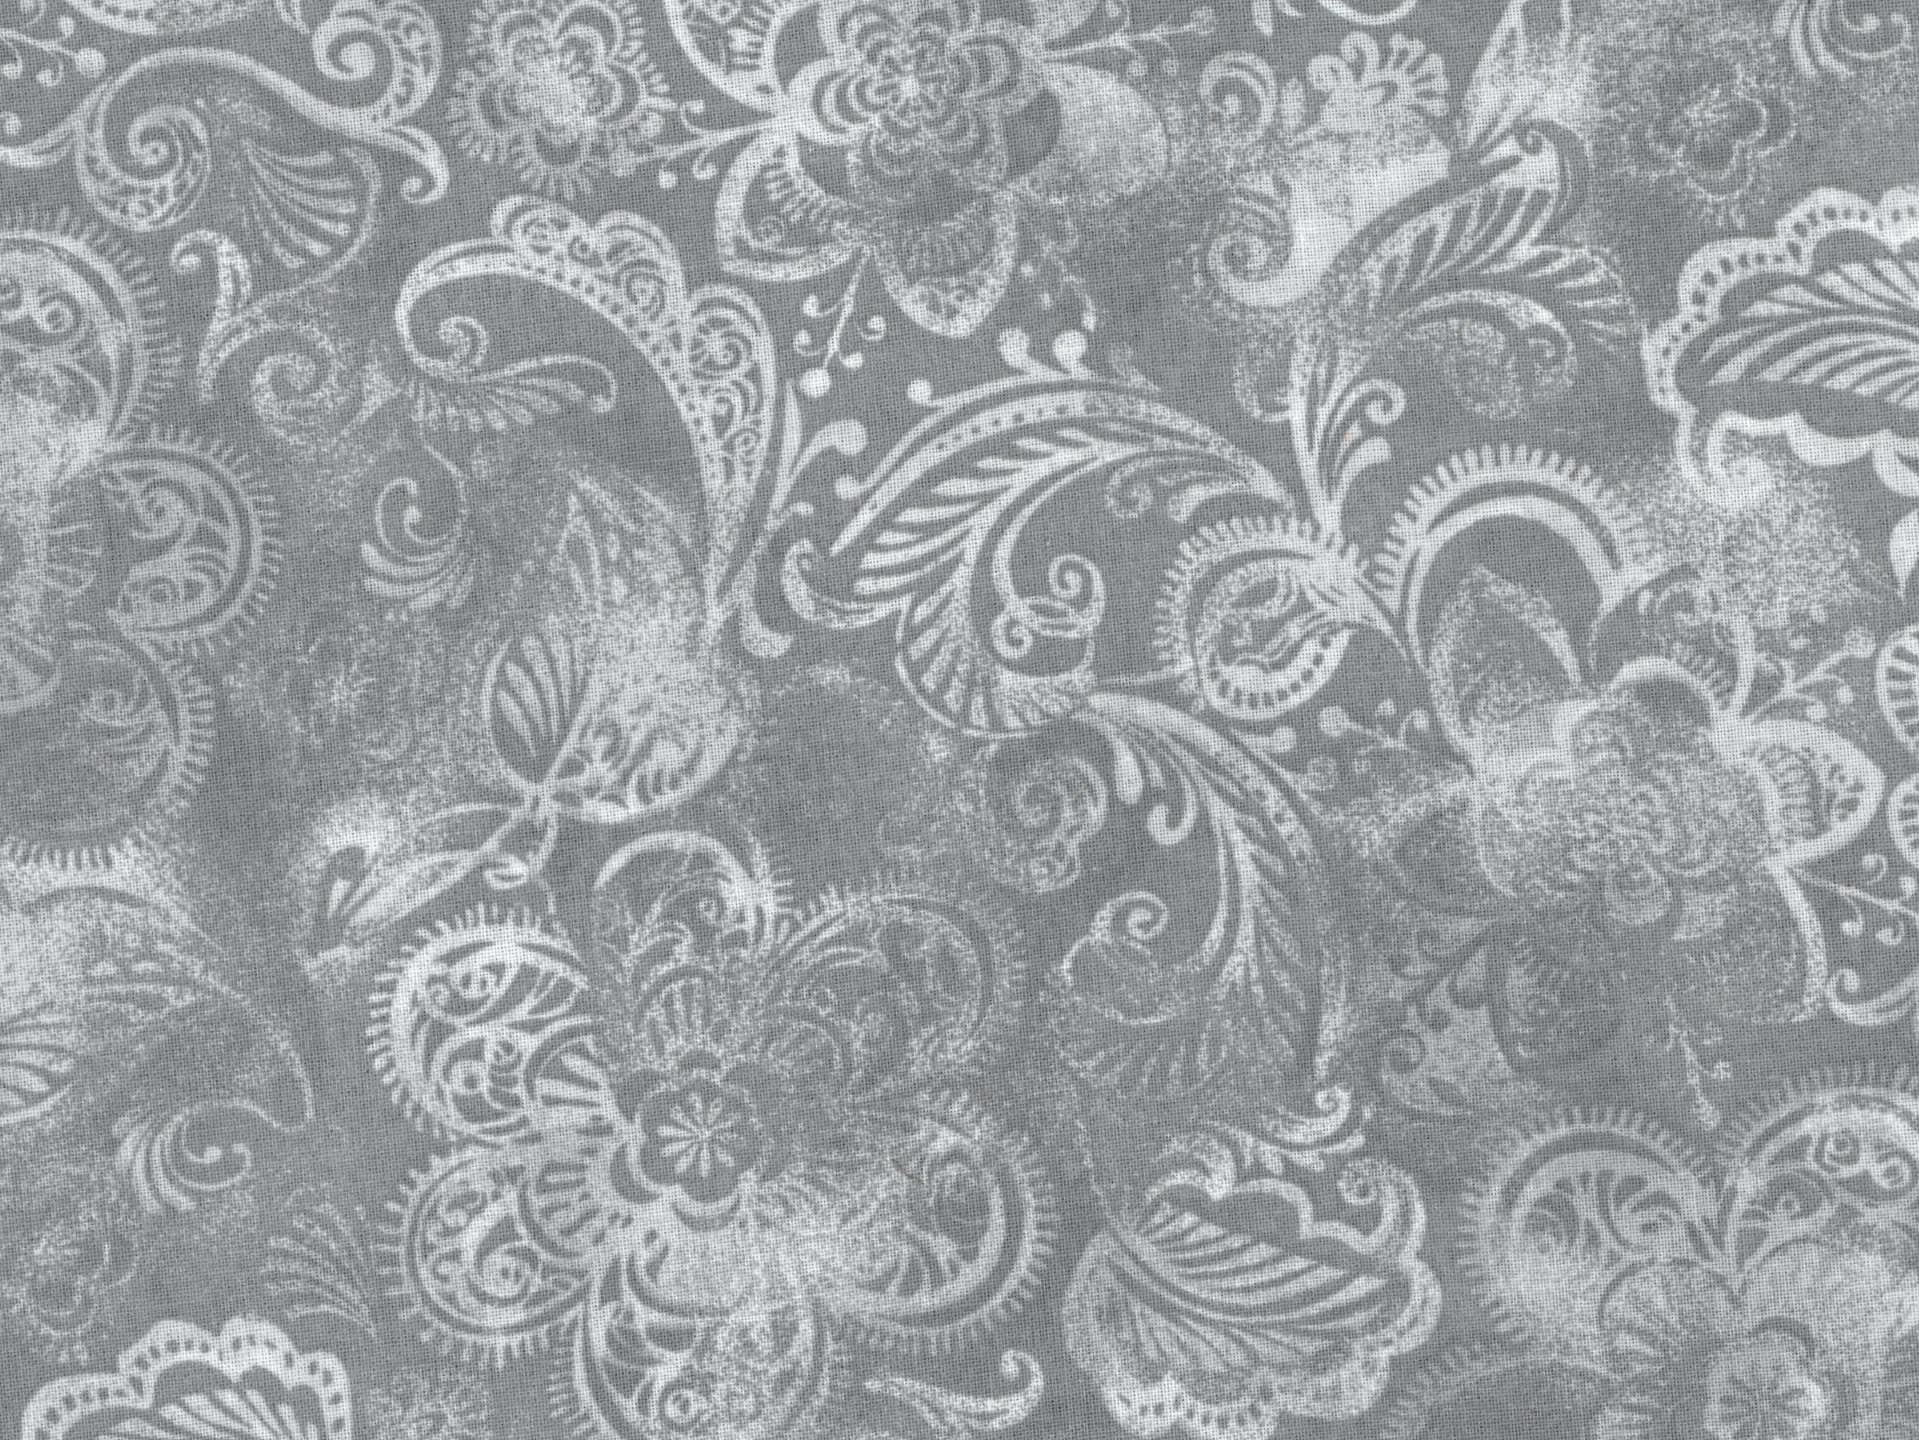 Quilt Back 108 Gray Floral